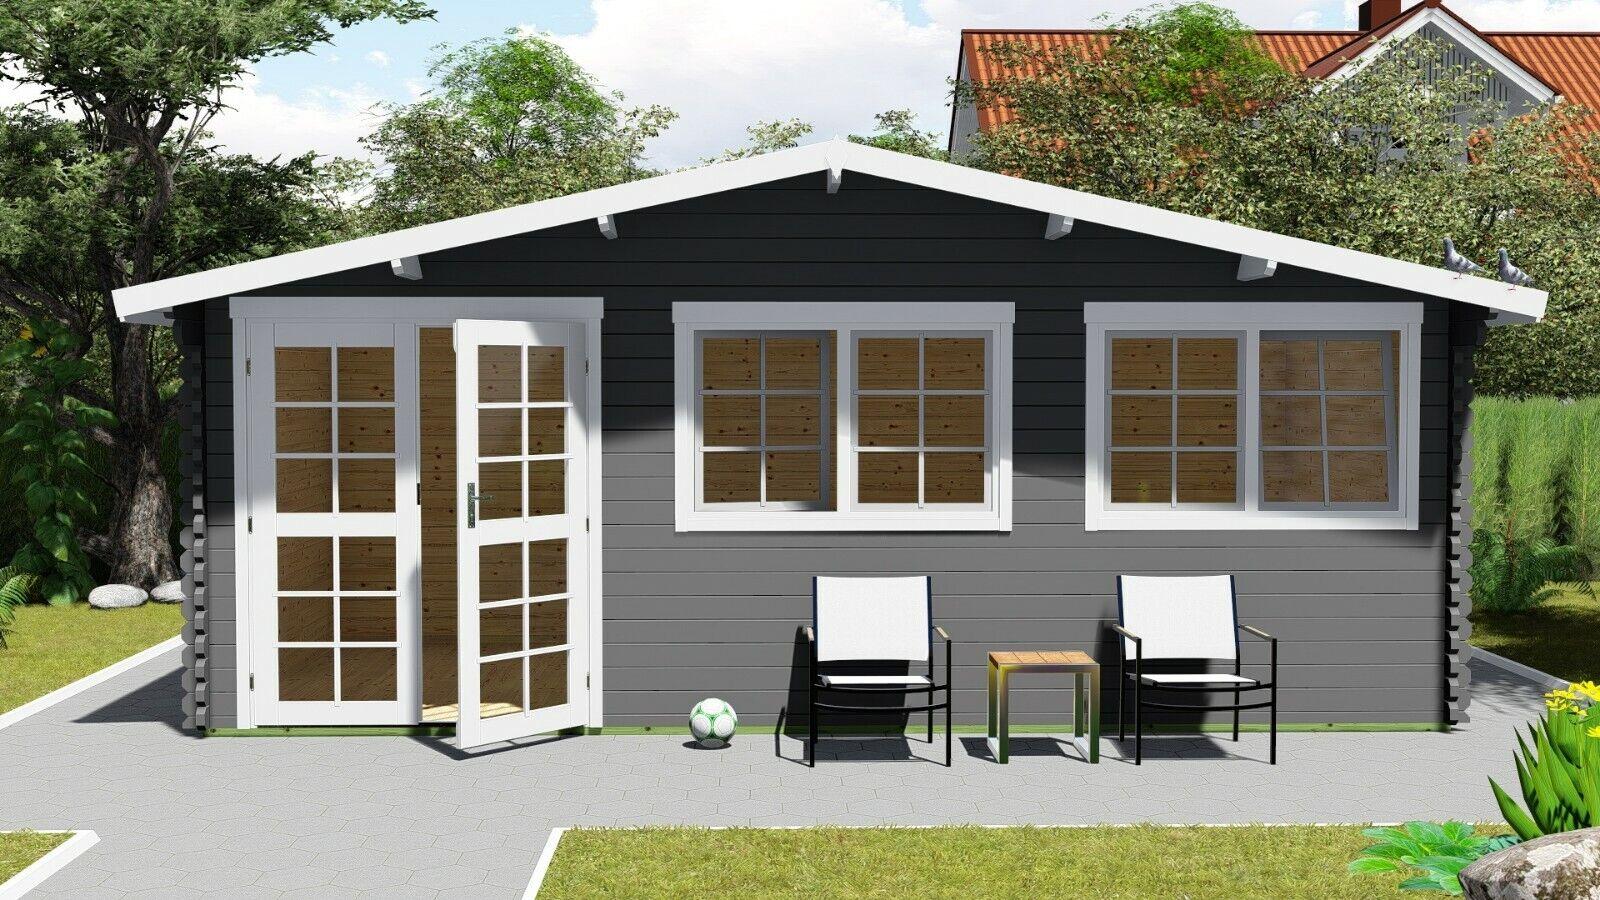 Gartenhaus Fußboden Ja Oder Nein ~ Gartenhaus holz mit fussboden test vergleich gartenhaus